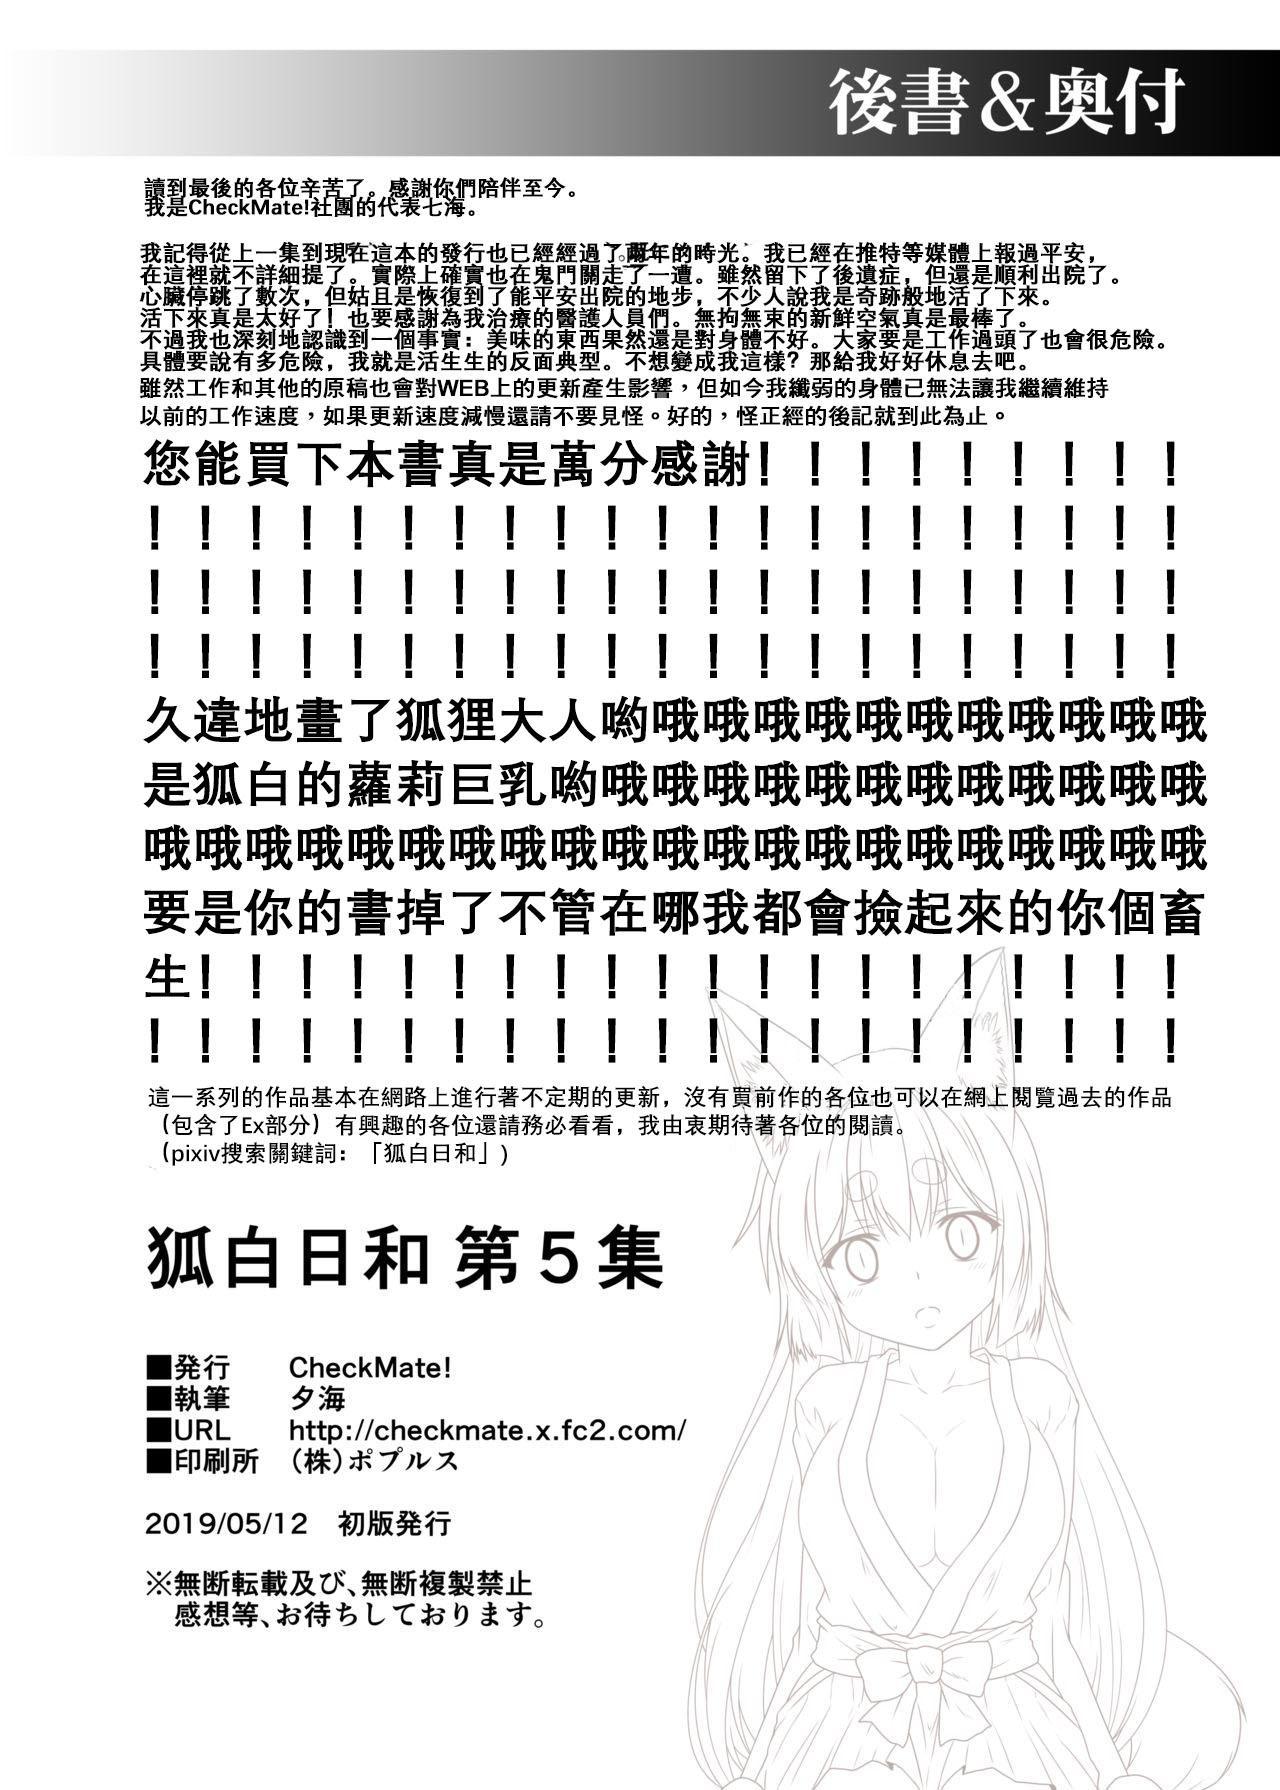 Kohaku Biyori Vol. 5 30